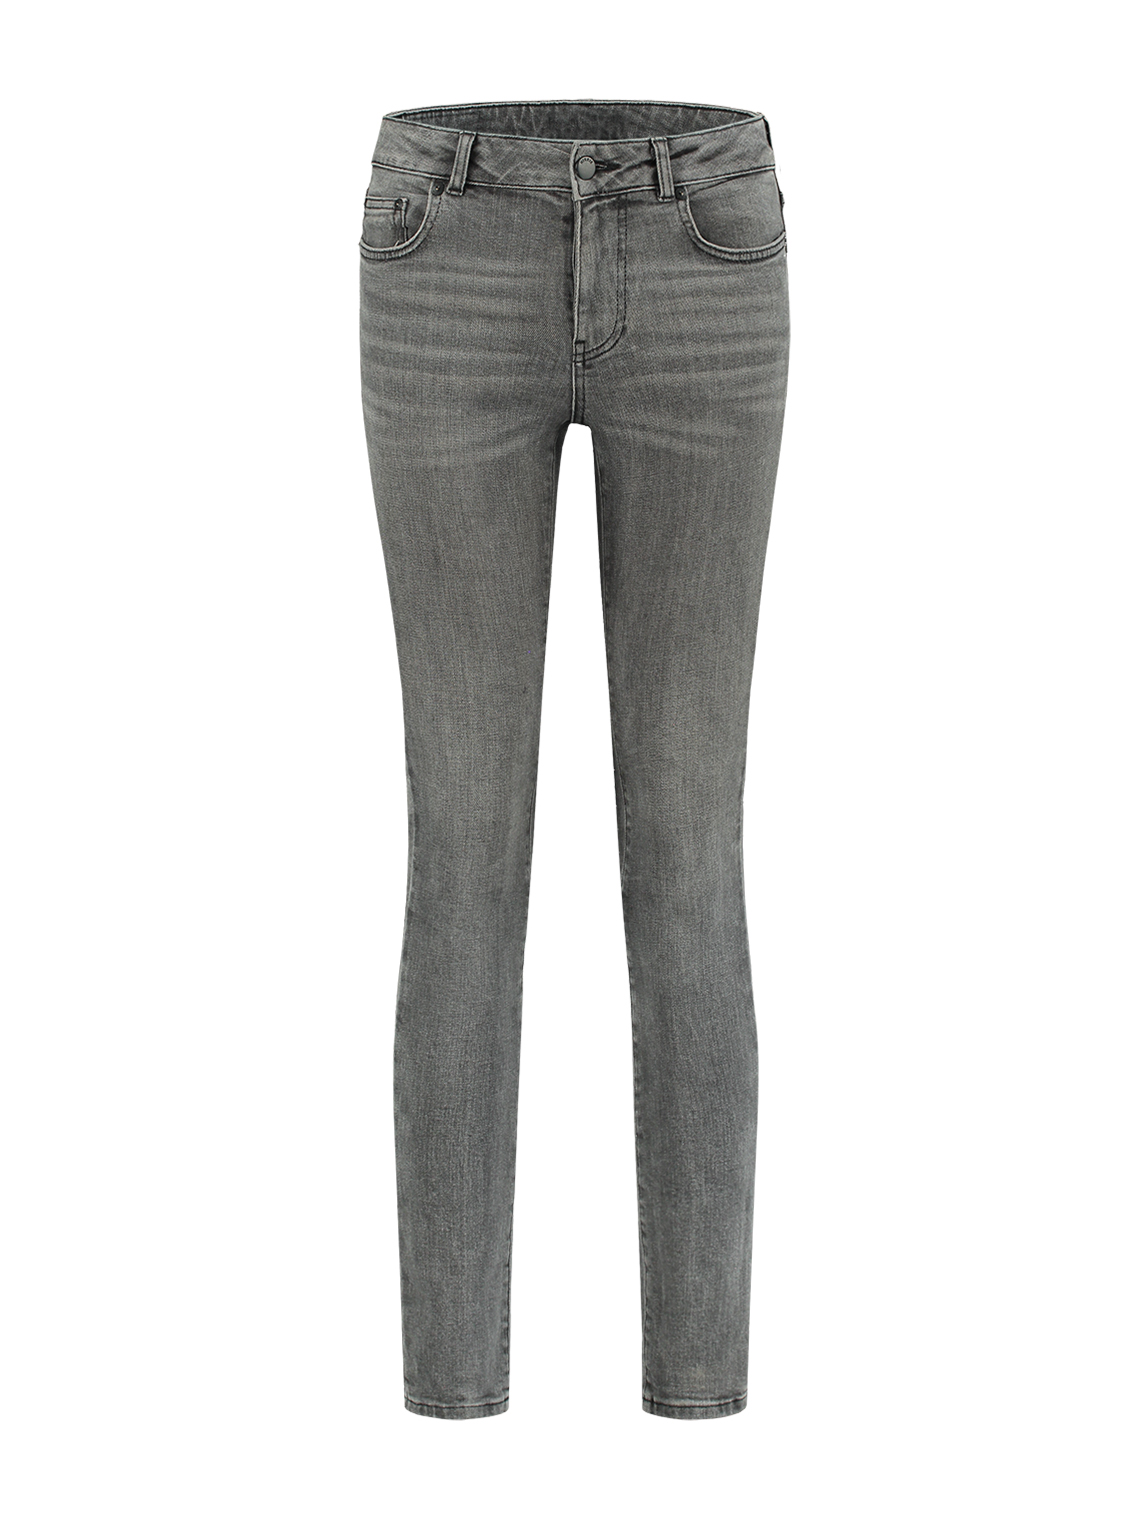 Grijze skinny dames jeans Nikkie Betty Skinny Jeans - N2-518 1805 8125